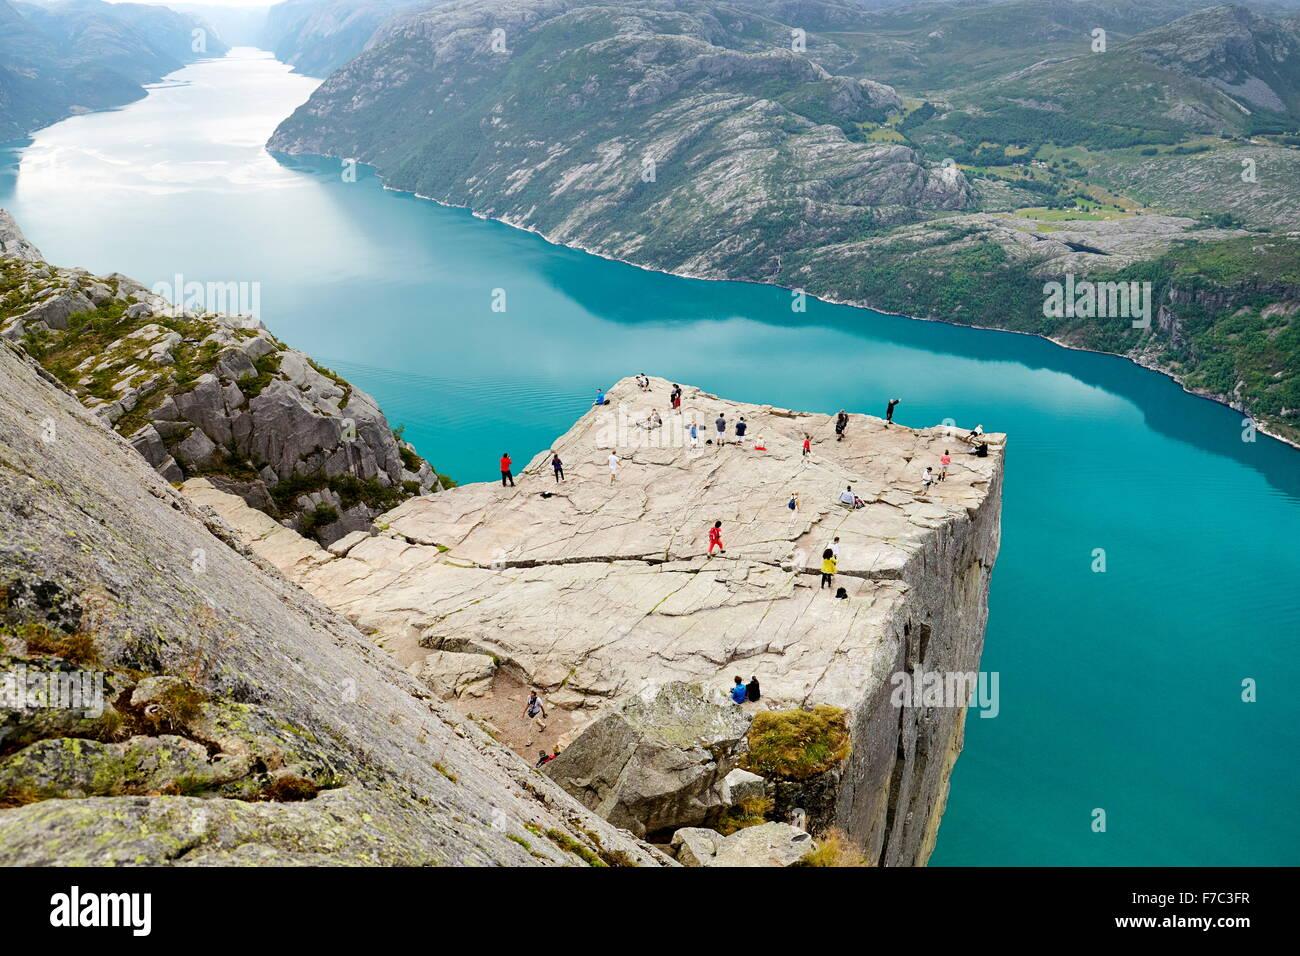 Landschaft des Preikestolen Preikestolen, Lysefjord, Norwegen Stockbild